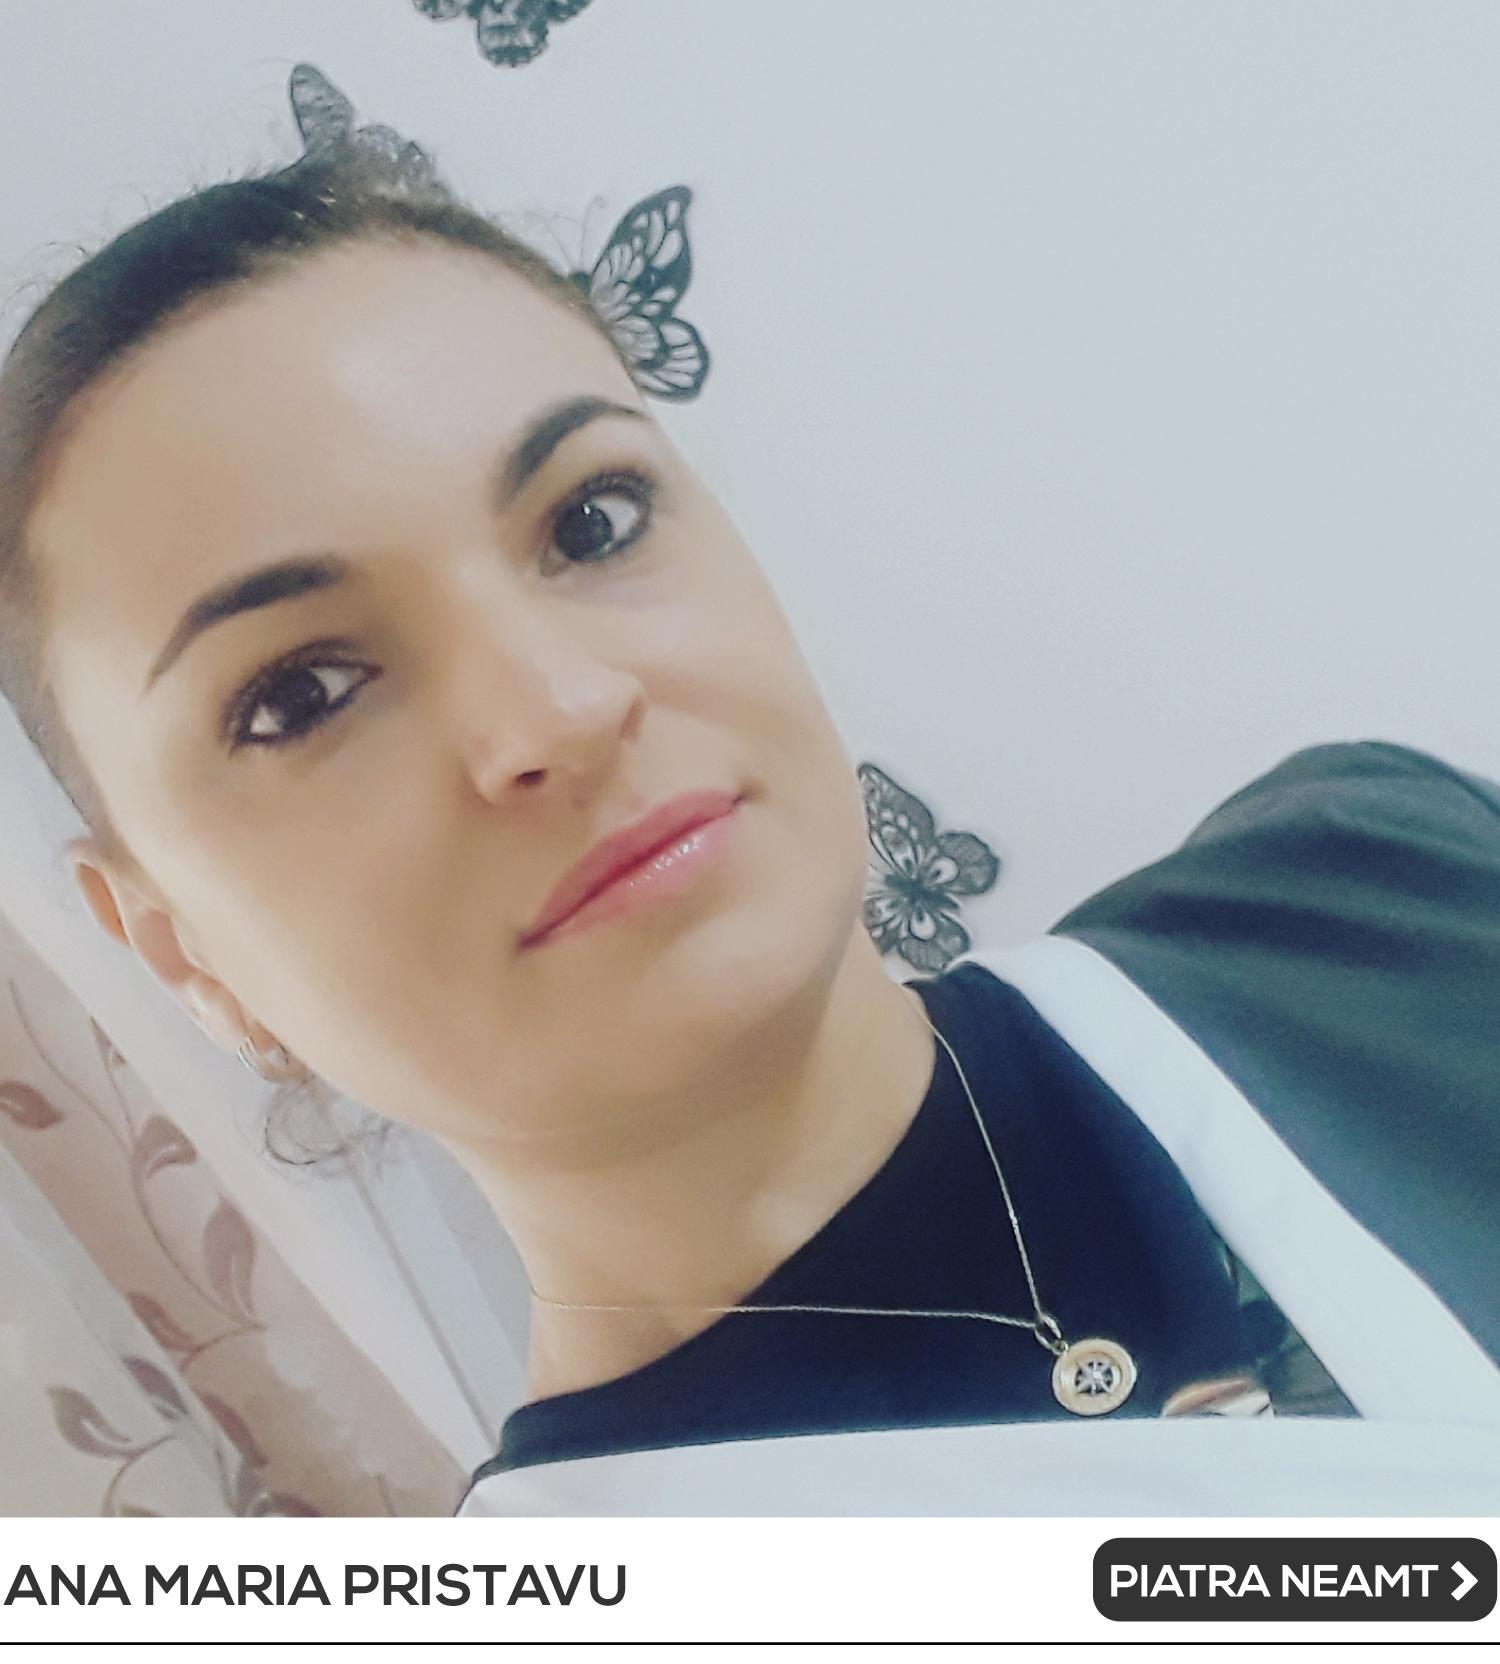 "<h5>NATURO-ESTETICIAN certificat PHYT'S France</h5><br /><strong><a href=""https://bit.ly/Ana-Maria-Pristavu-Piatra-Neamt""><u>Link acces Formular Diagnoza on-line</u></a></strong><br><a href=""https://www.facebook.com/cosmeticasimakeupanamariapristavu/""><img alt=""Imagini pentru facebook"" src=""https://upload.wikimedia.org/wikipedia/commons/thumb/8/83/Facebook_Messenger_4_Logo.svg/1200px-Facebook_Messenger_4_Logo.svg.png"" style=""width: 20px; height: 20px; float: center; margin-left: 5px; margin-right: 5px;"" /></a><a href=""https://www.facebook.com/cosmeticasimakeupanamariapristavu/"">Scrie pe Facebook</a><br><img alt="""" src=""https://www.phytsromania.ro/domains/phytsromania.ro/files/files/consultanti/phone-icon.png"" style=""margin: 0px 5px; float: center; width: 20px; height: 20px;"" />0757 140 101<br>COD VOUCHER DISCOUNT: <b>ANCAPRIS</b><br><br>"